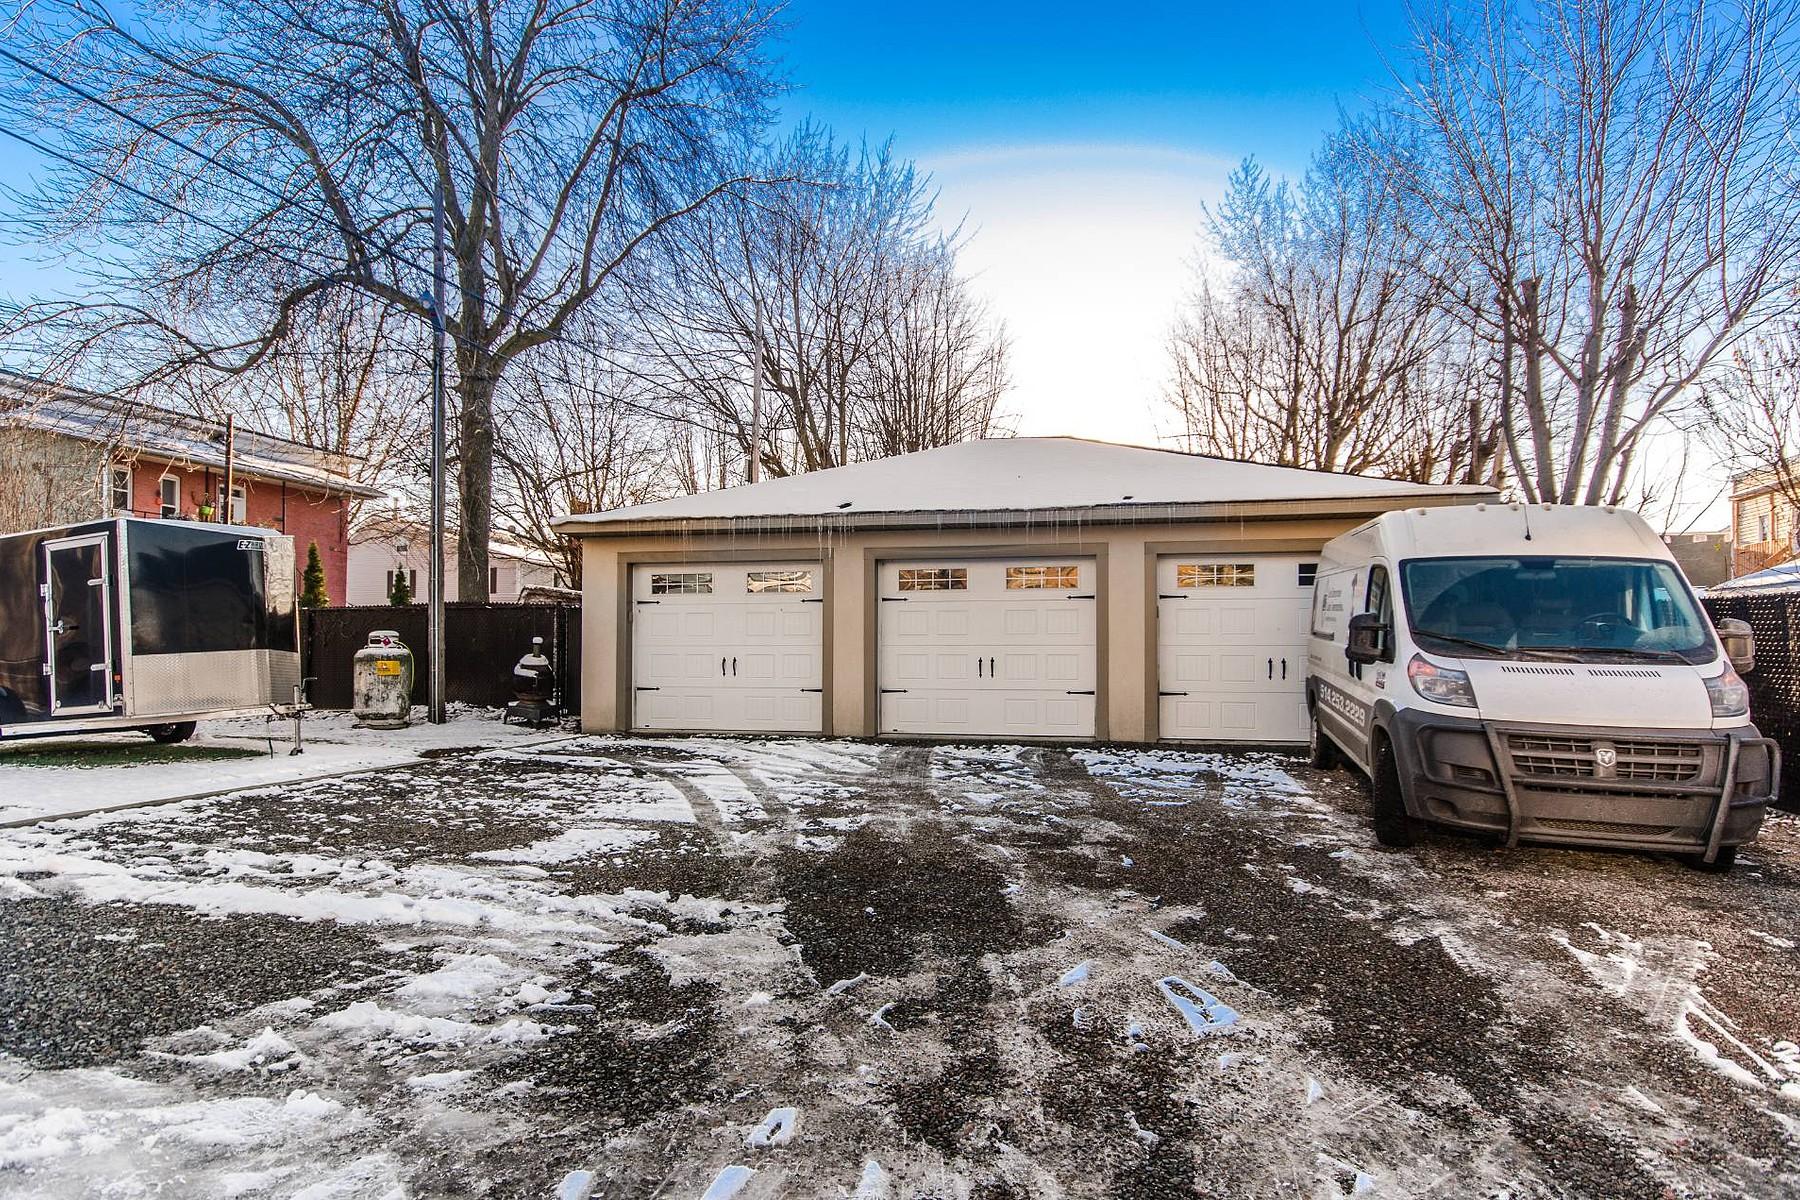 Additional photo for property listing at Saint-Hyacinthe, Montérégie 2610 Rue Girouard O. Saint-Hyacinthe, Québec J2S2B4 Canada